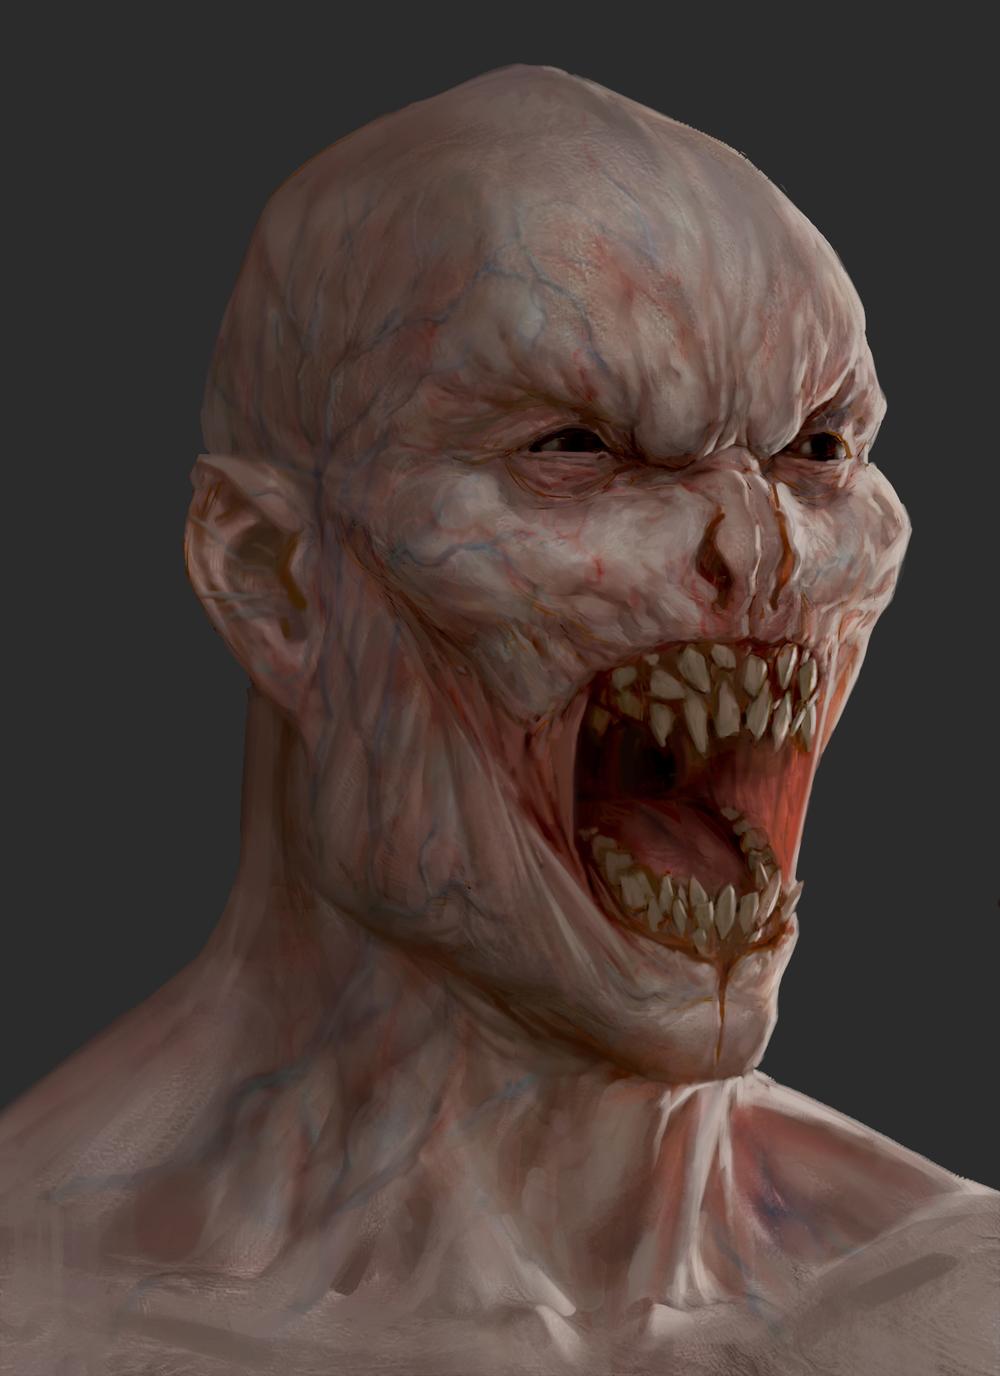 Vampire_incrate_portrait.jpg